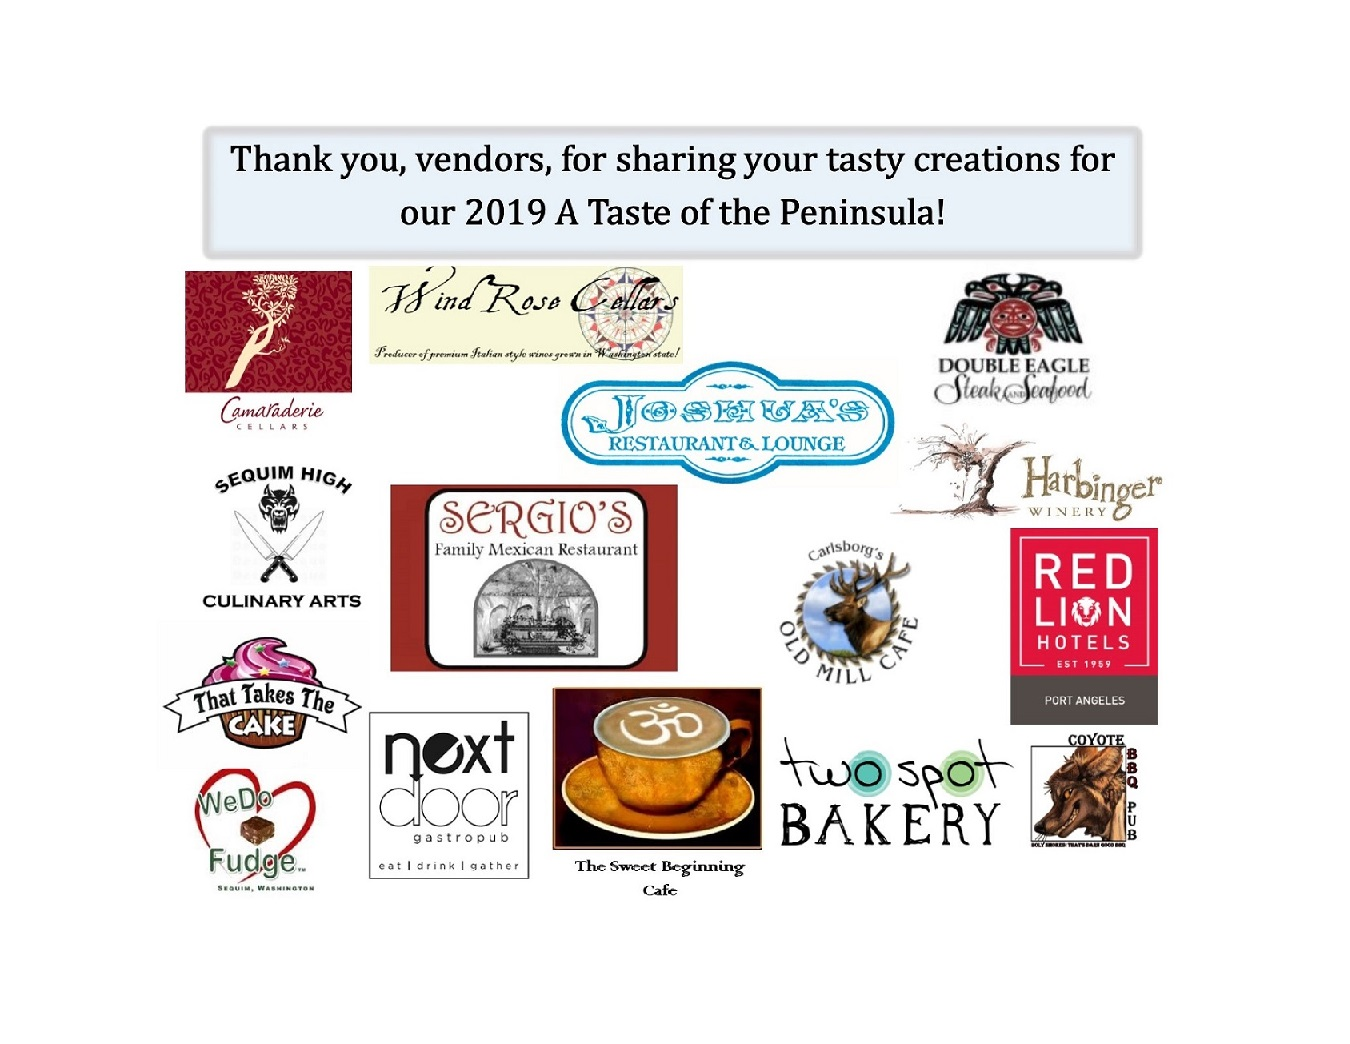 2019 A Taste of the Peninsula Food & Beverage Vendors